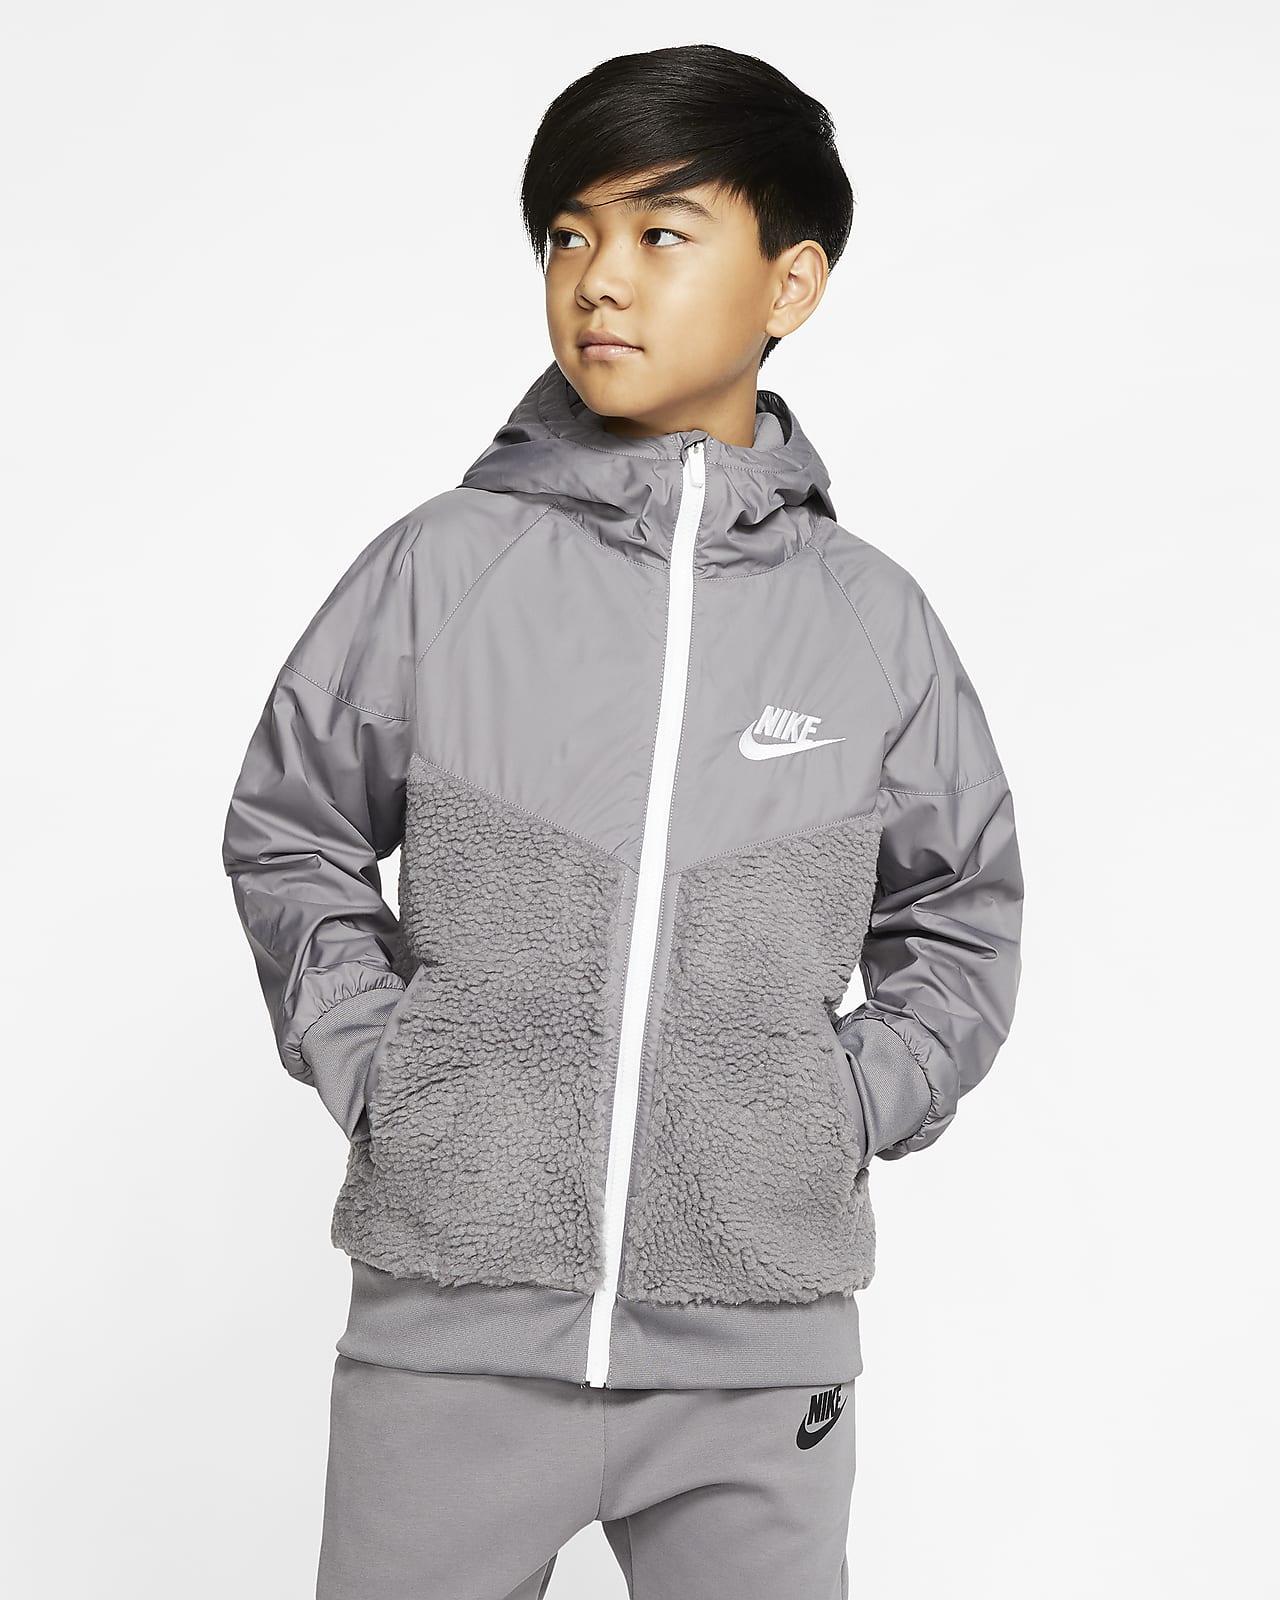 Nike Sportswear Windrunner Sherpa Jacke für ältere Kinder (Jungen)